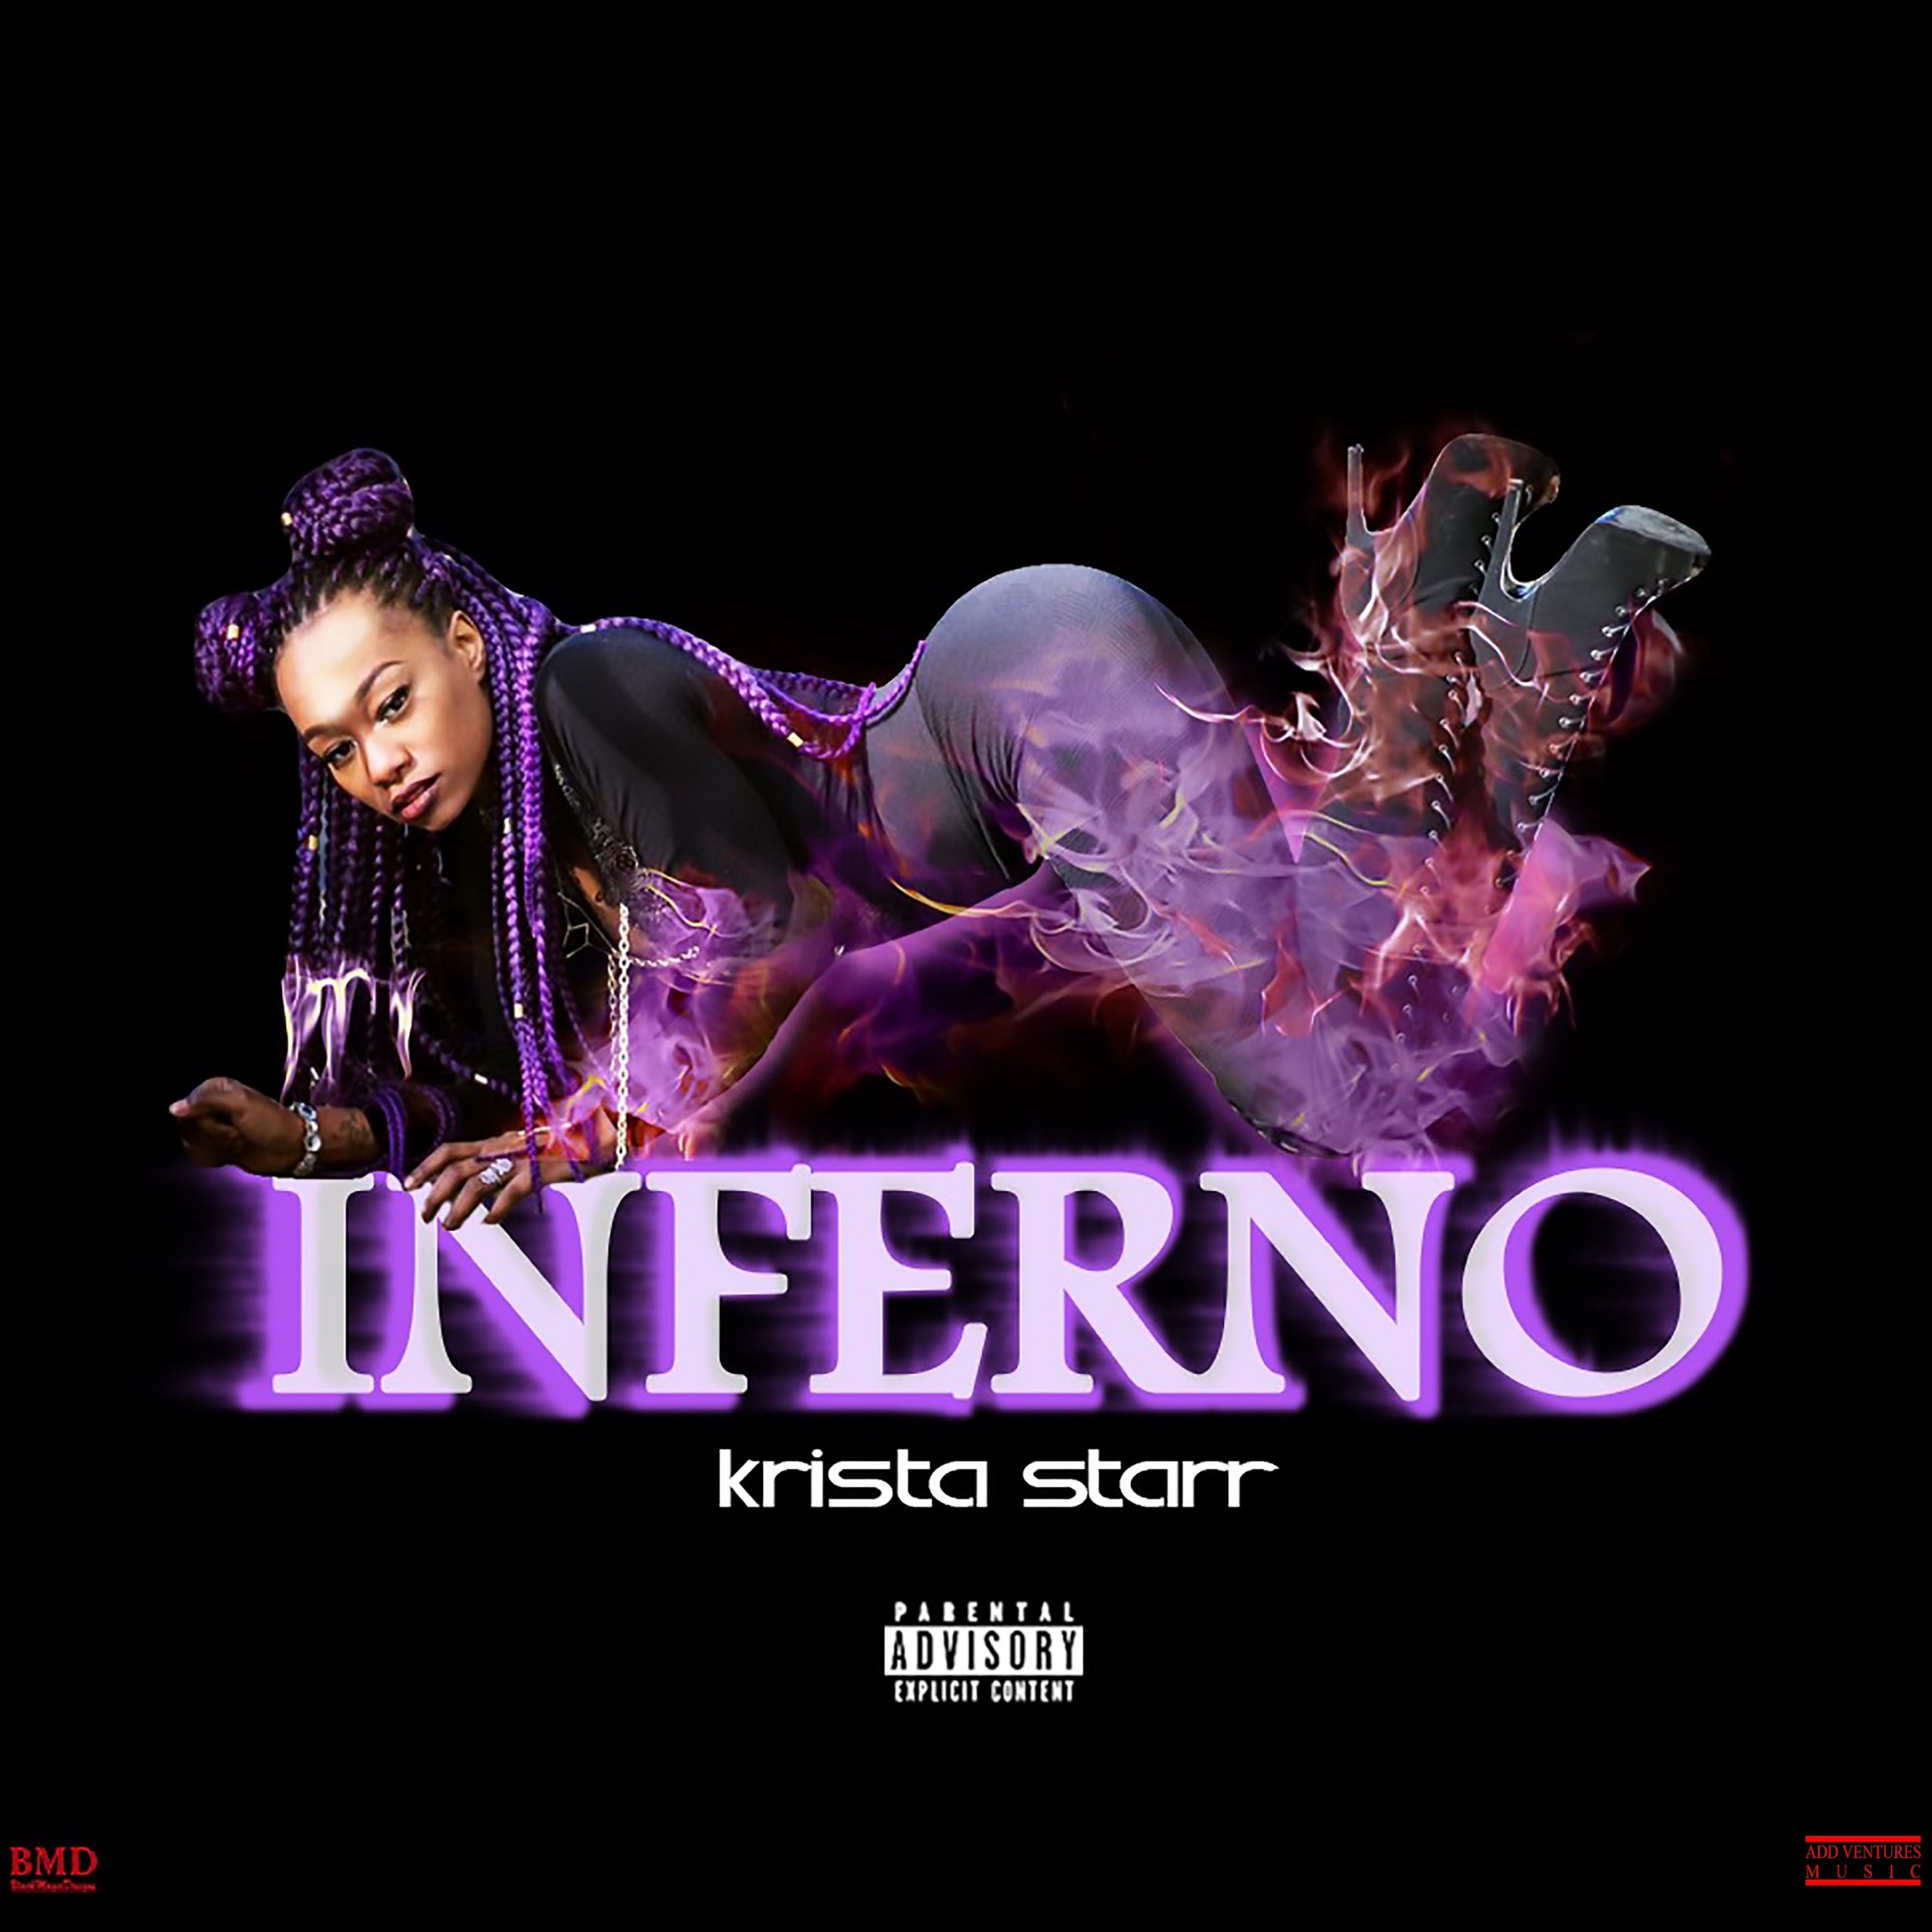 Krista Starr - Inferno Explicit Single.jpeg